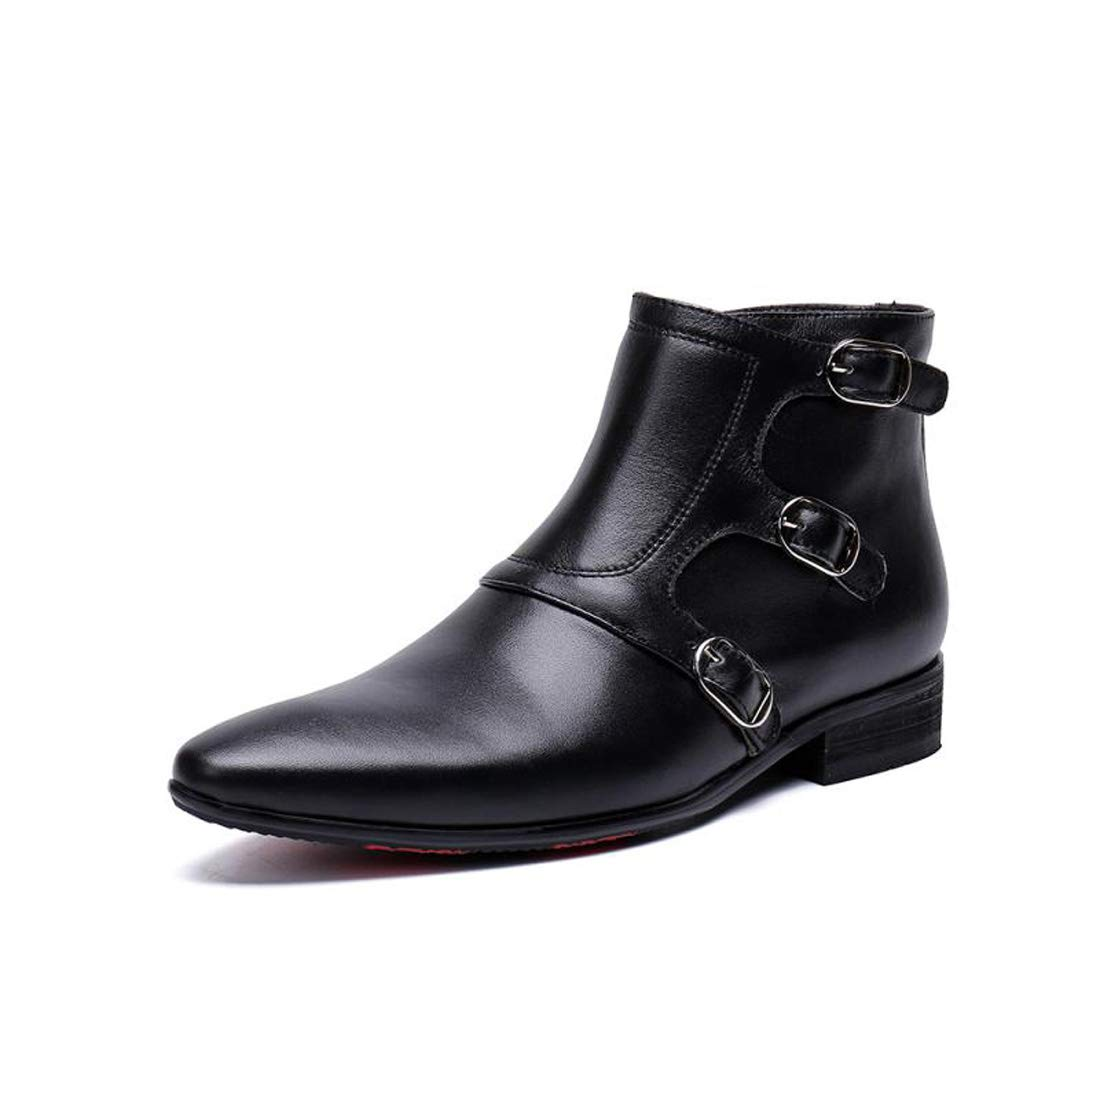 DANDANJIE Herren Stiefel Schuhe Leder Mode Stiefelspitze Zehen-Stiefelies Martin Stiefel